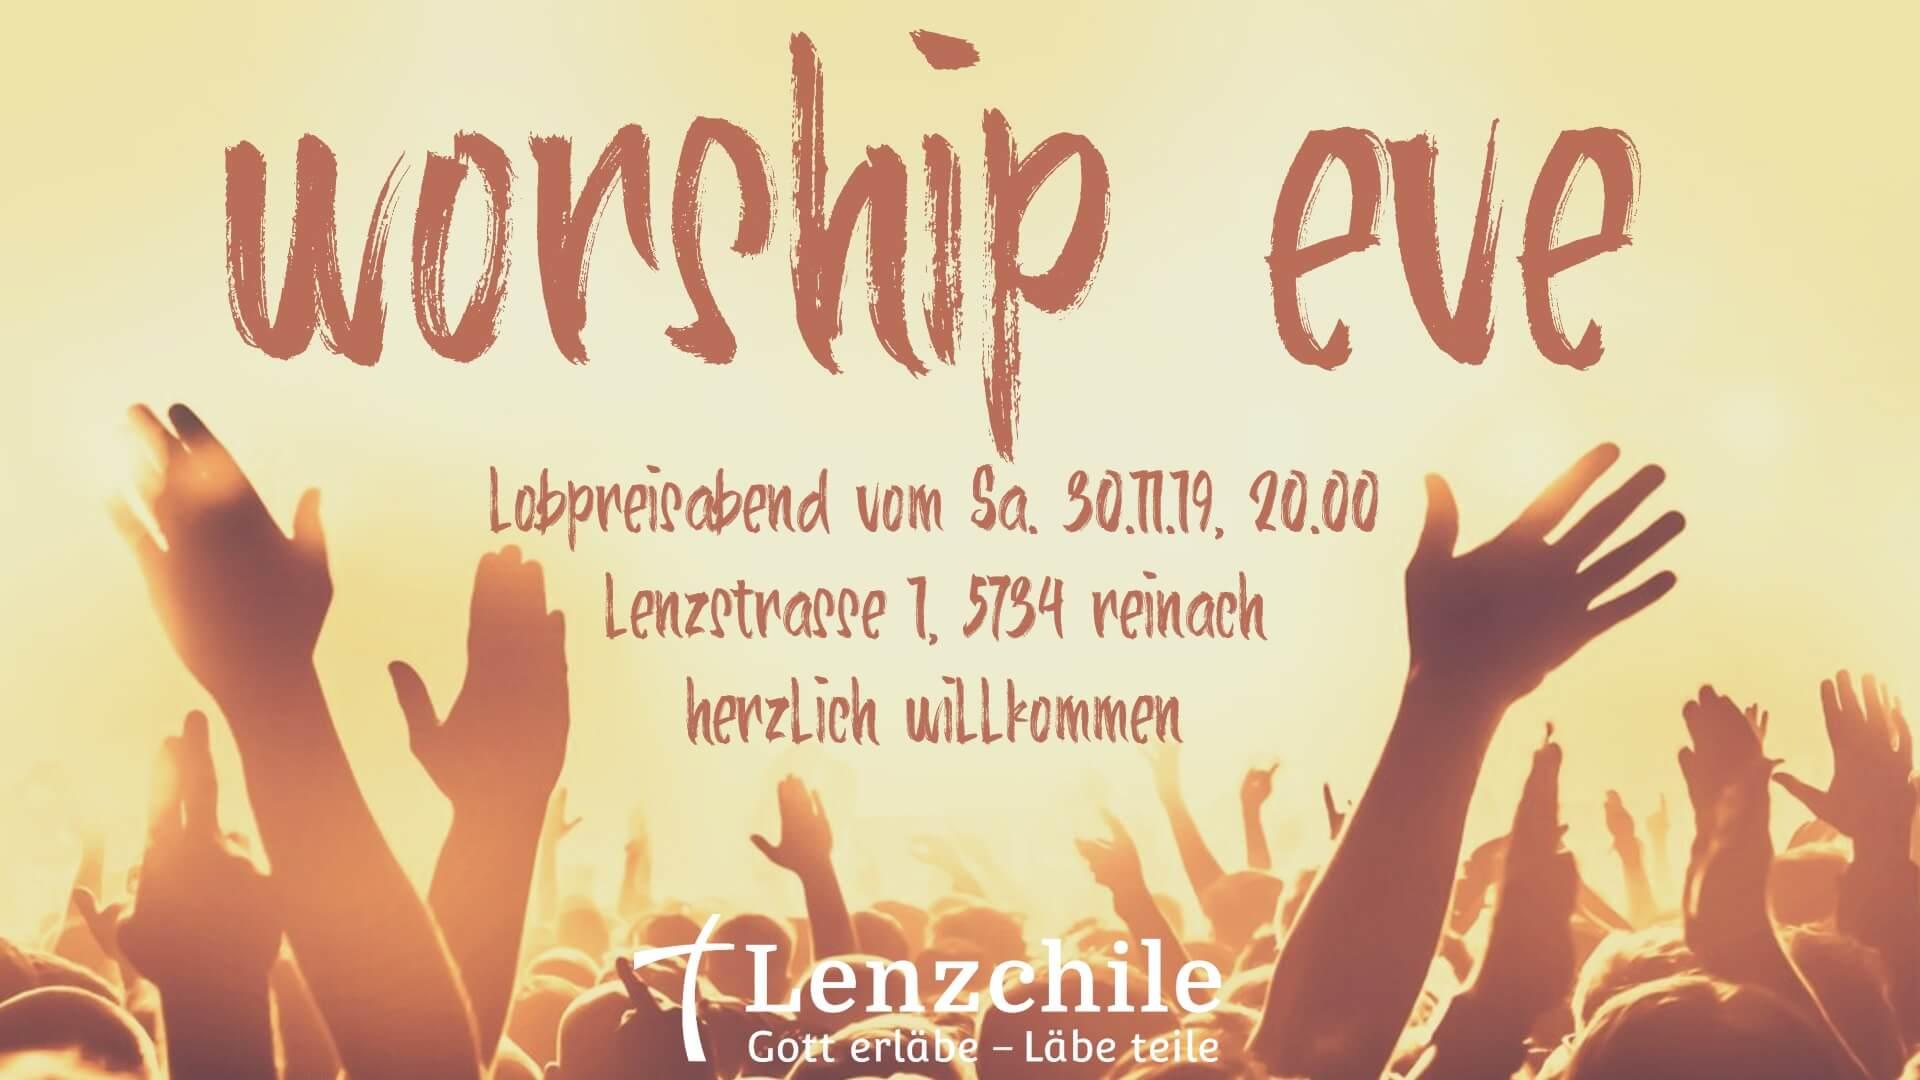 19-11-30 worship eve